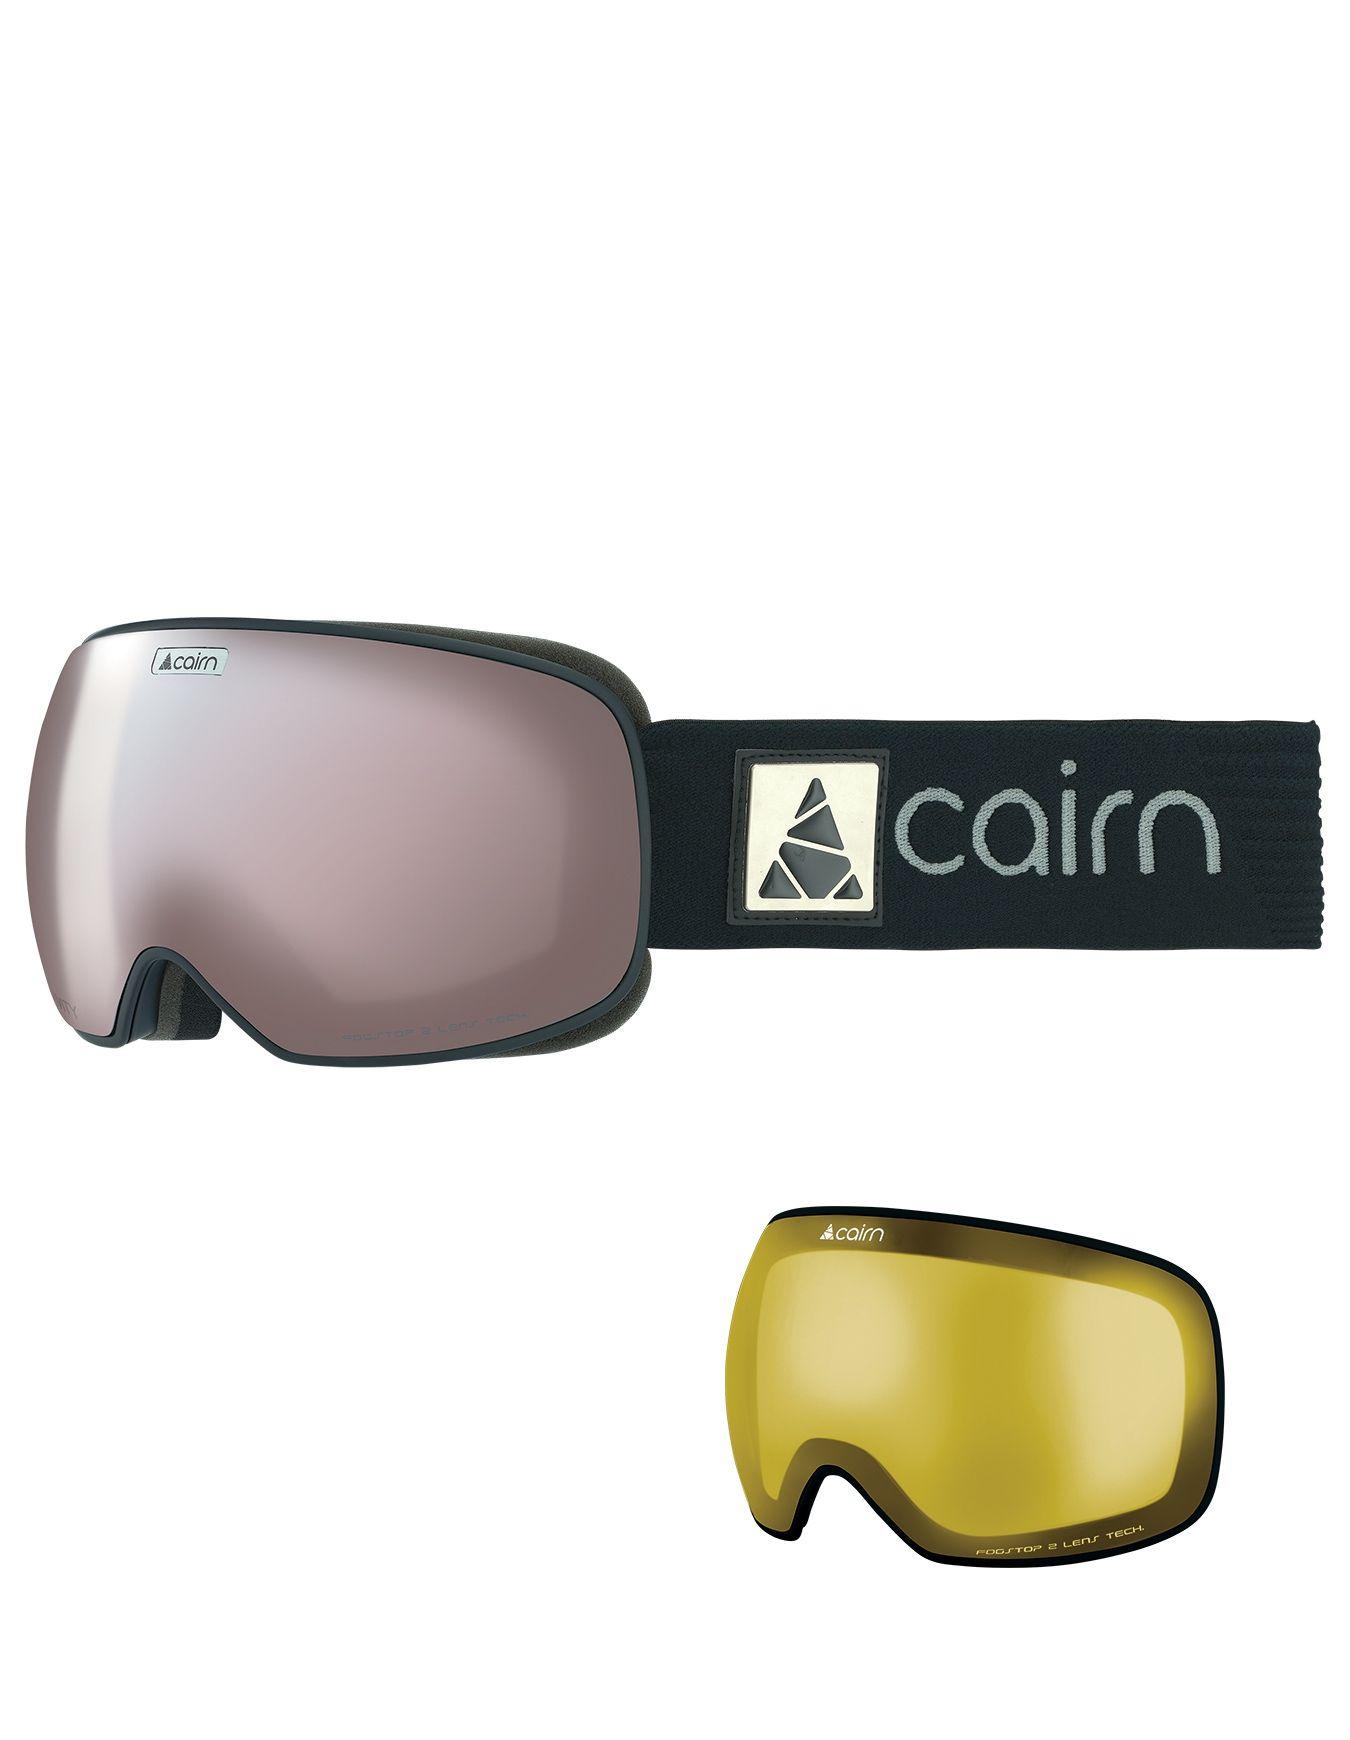 Cairn Black Snowleader Masques Spx3000 De Silver Ski Mat Gravity w1qzfg7v 10f0930d63e9